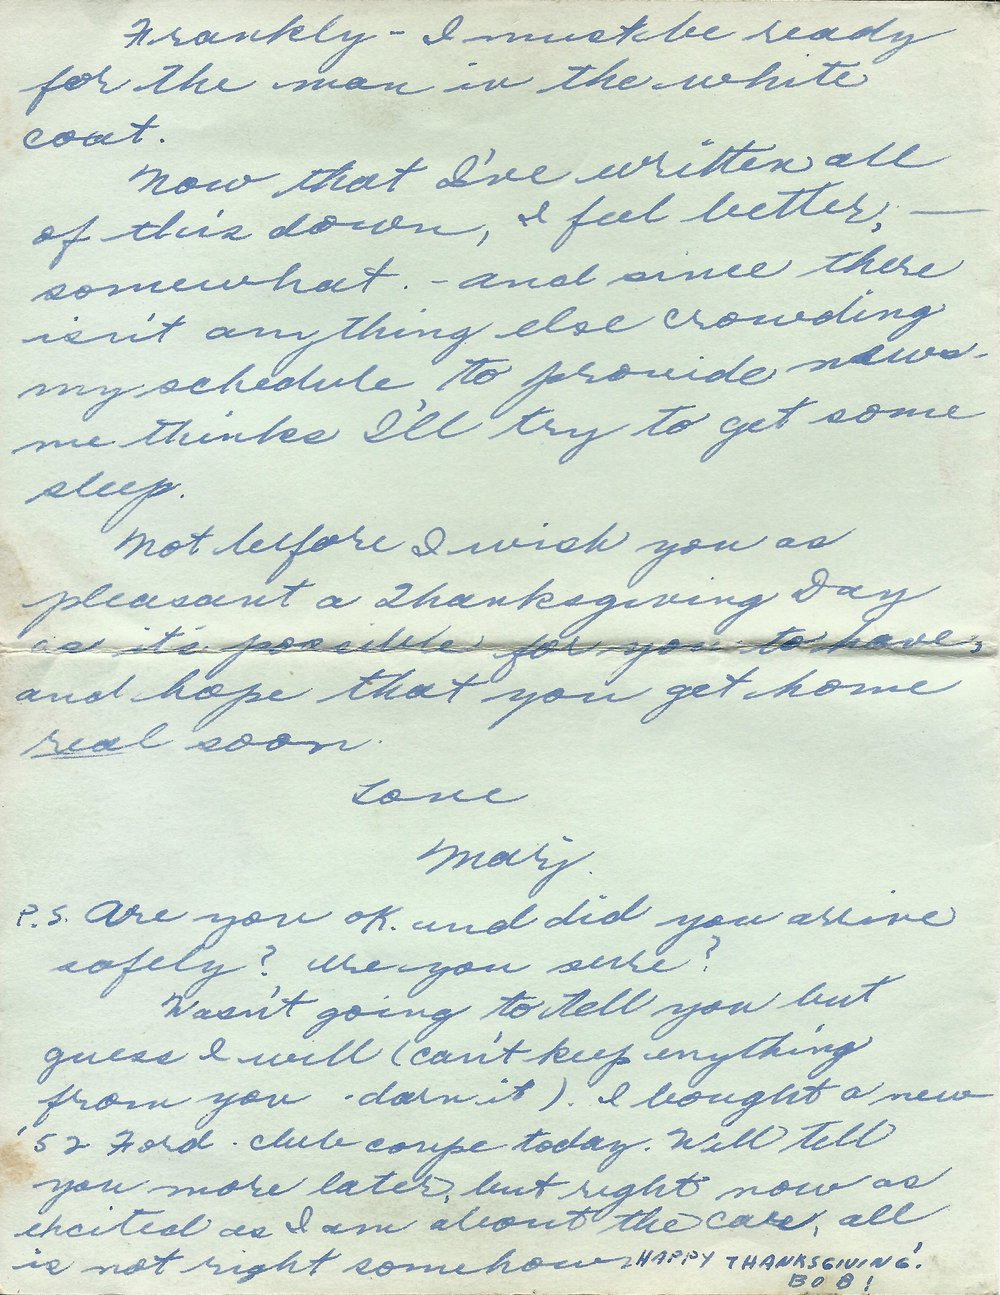 10. Nov. 24, 1952 (Oma)_Page_4.jpg